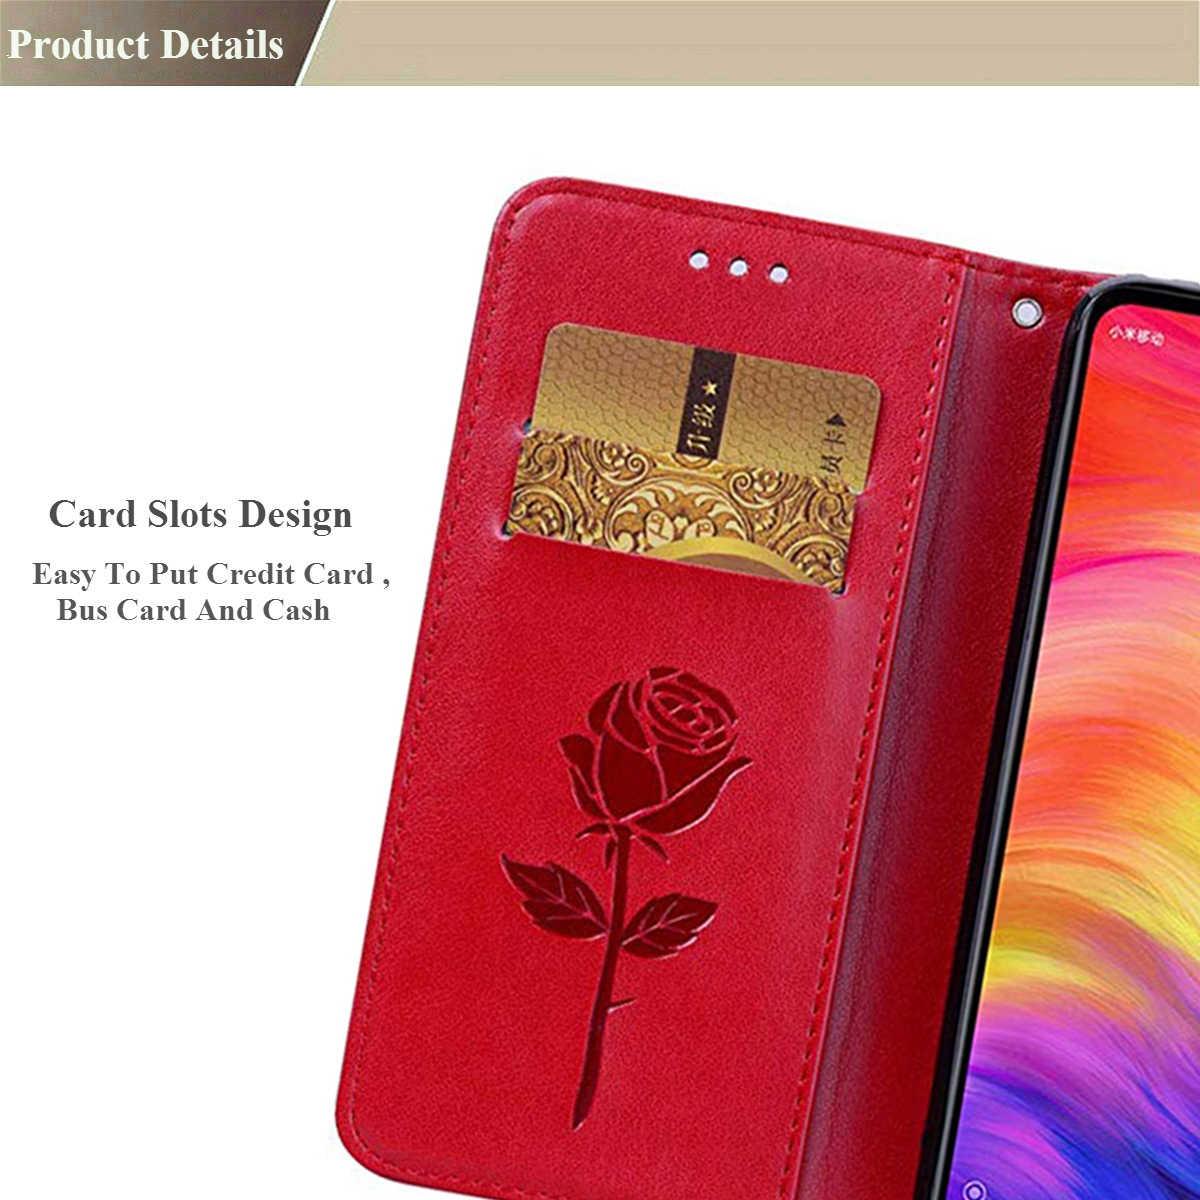 Meizu Note 9 กระเป๋าสตางค์หนังกรณี Maisie Meizy Maizu M5S M5c M6S M6T Pro 7 U10 16th พลิกสำหรับ Meizu M5 M6 M2 M3 หมายเหตุ